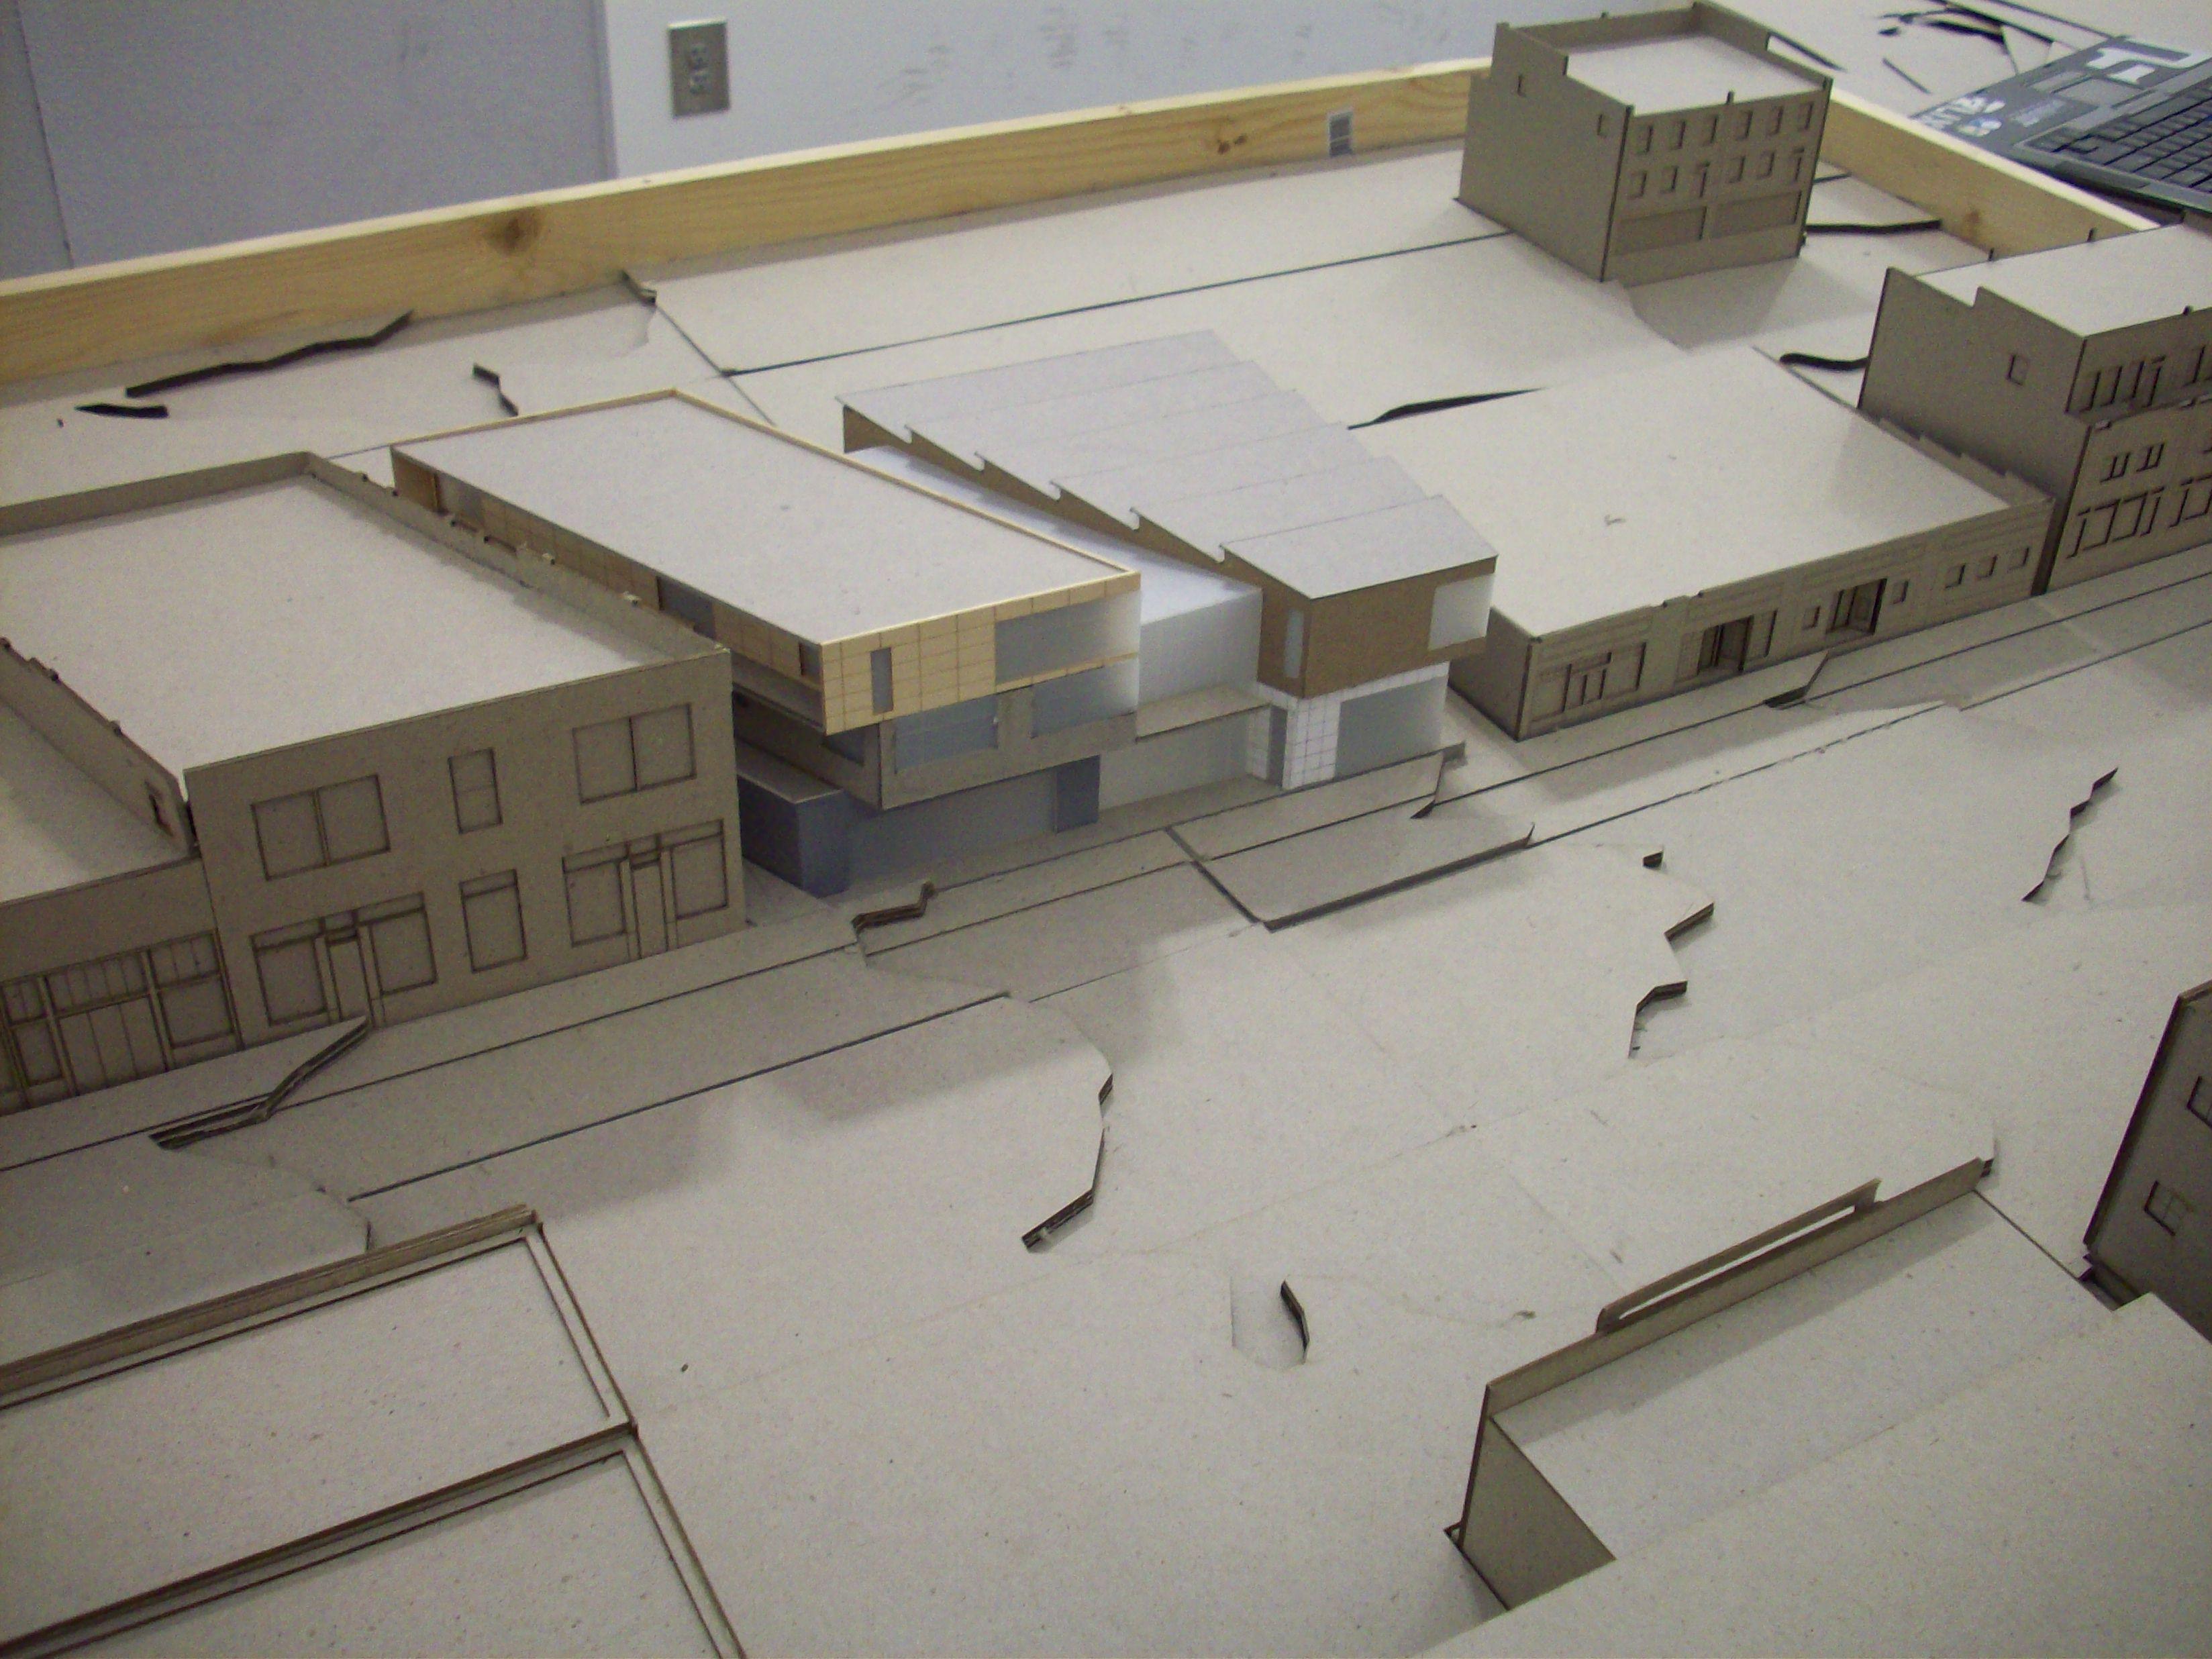 Model of my design for architecture studio